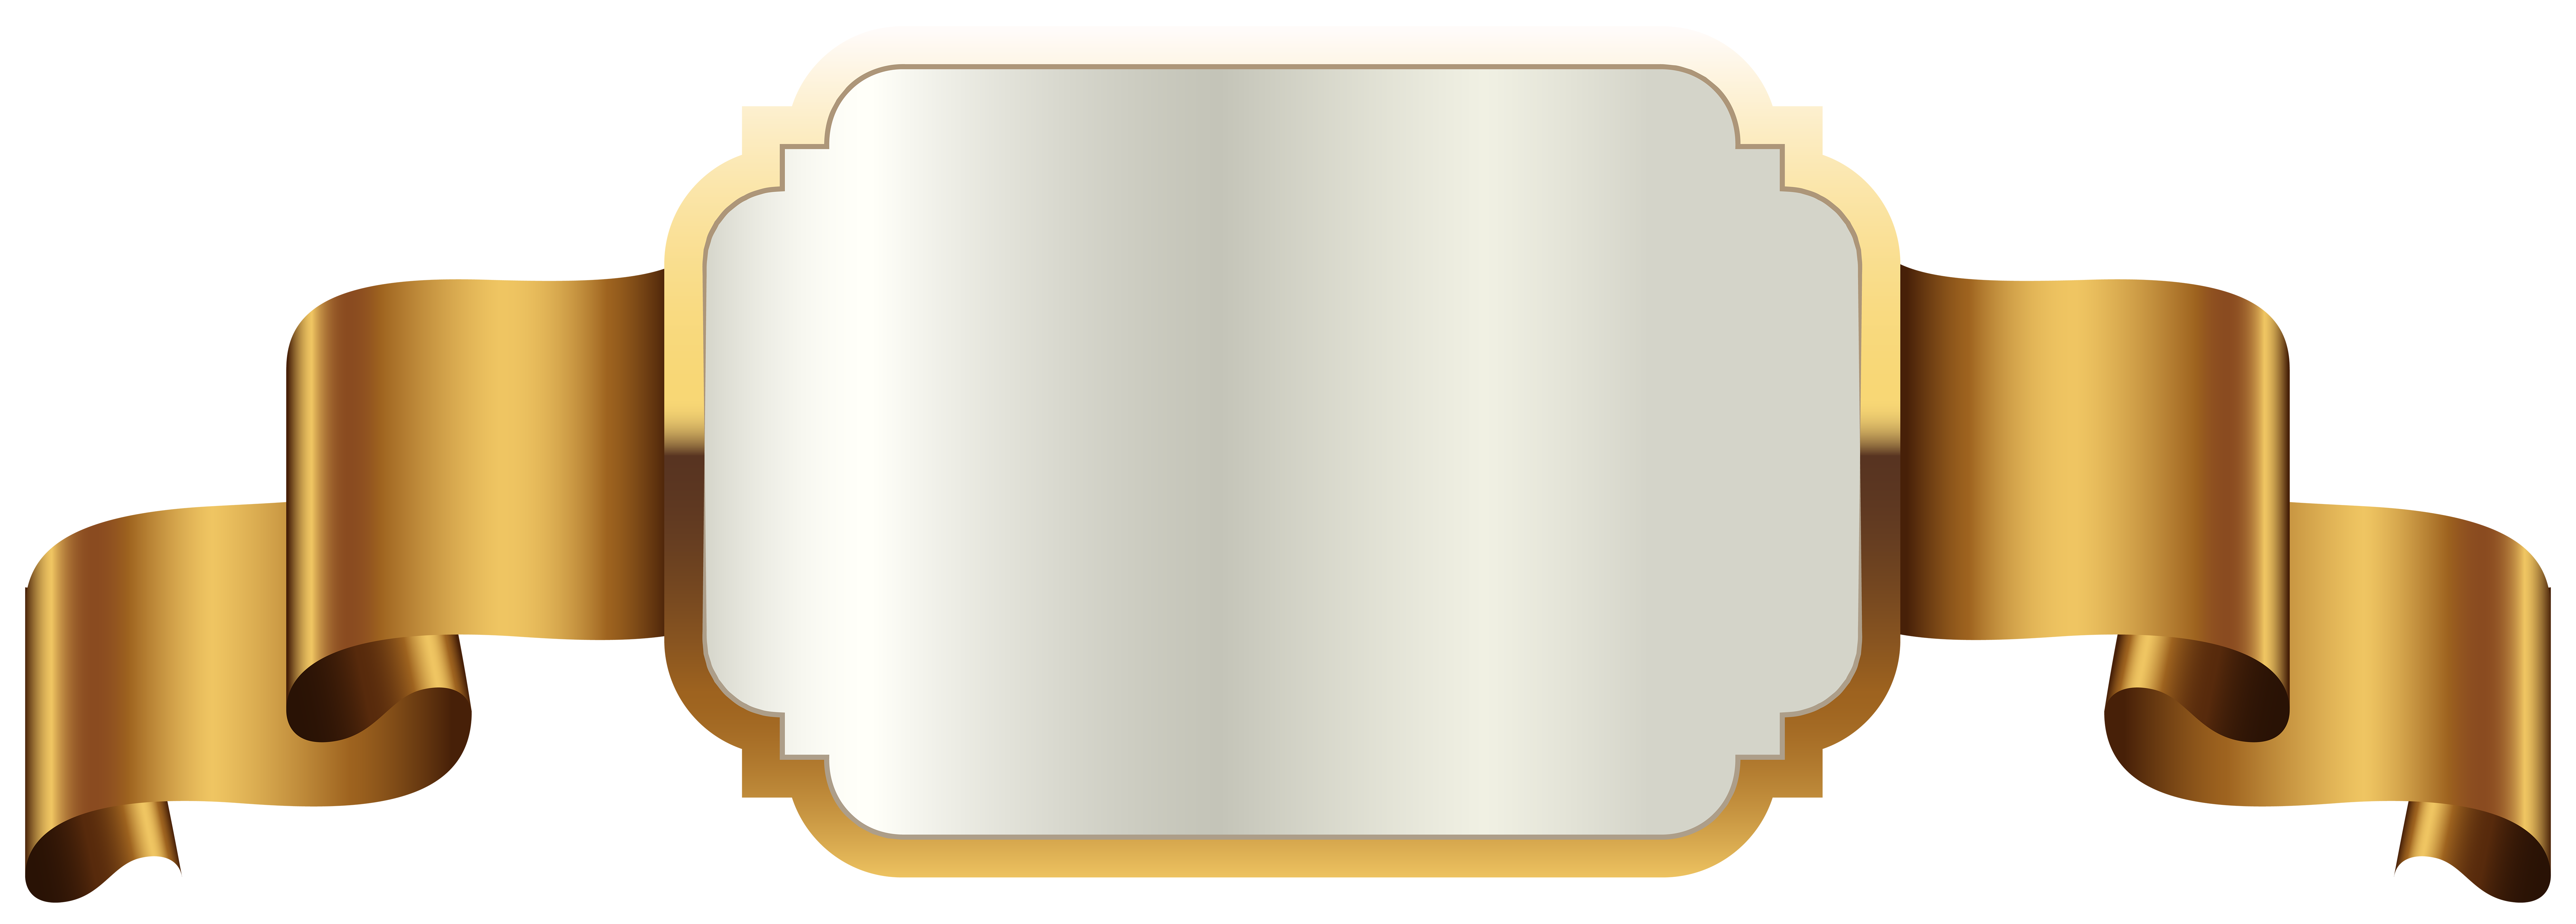 Gold Label Template Transparent PNG Clip Art Image.